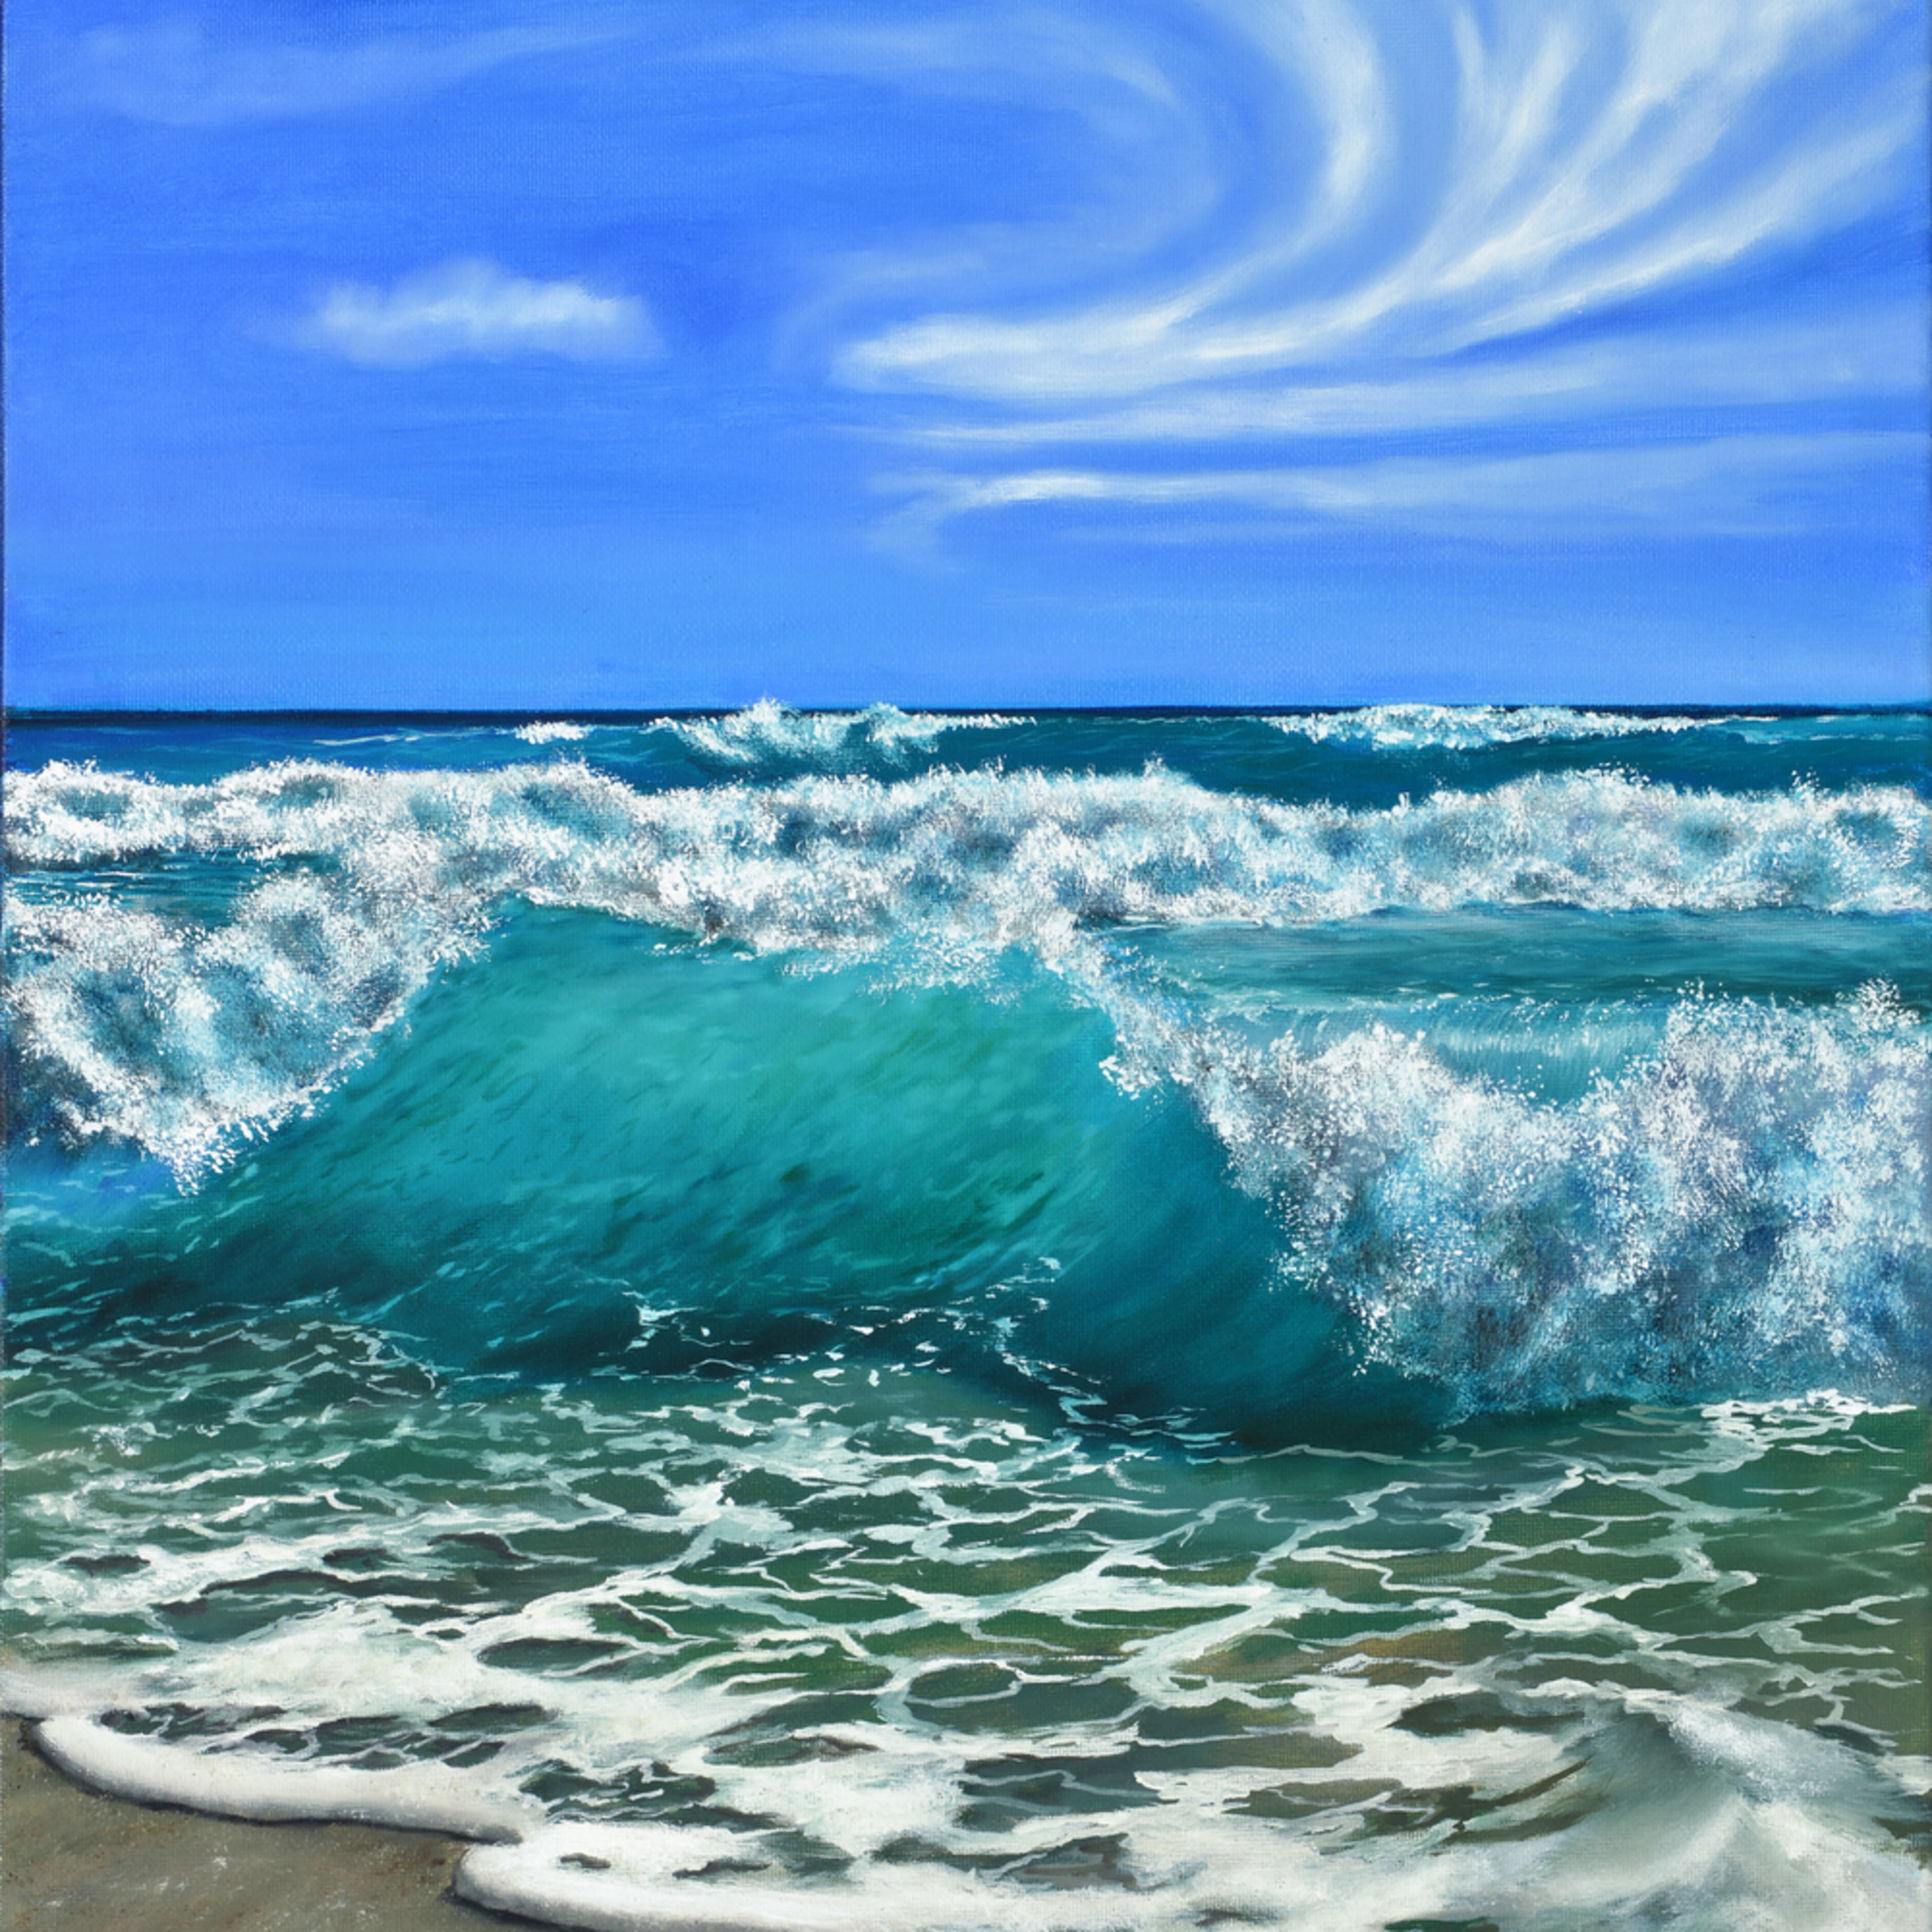 07  beach waves oil on canvas by monica marquez gatica mmg art studio n4peug